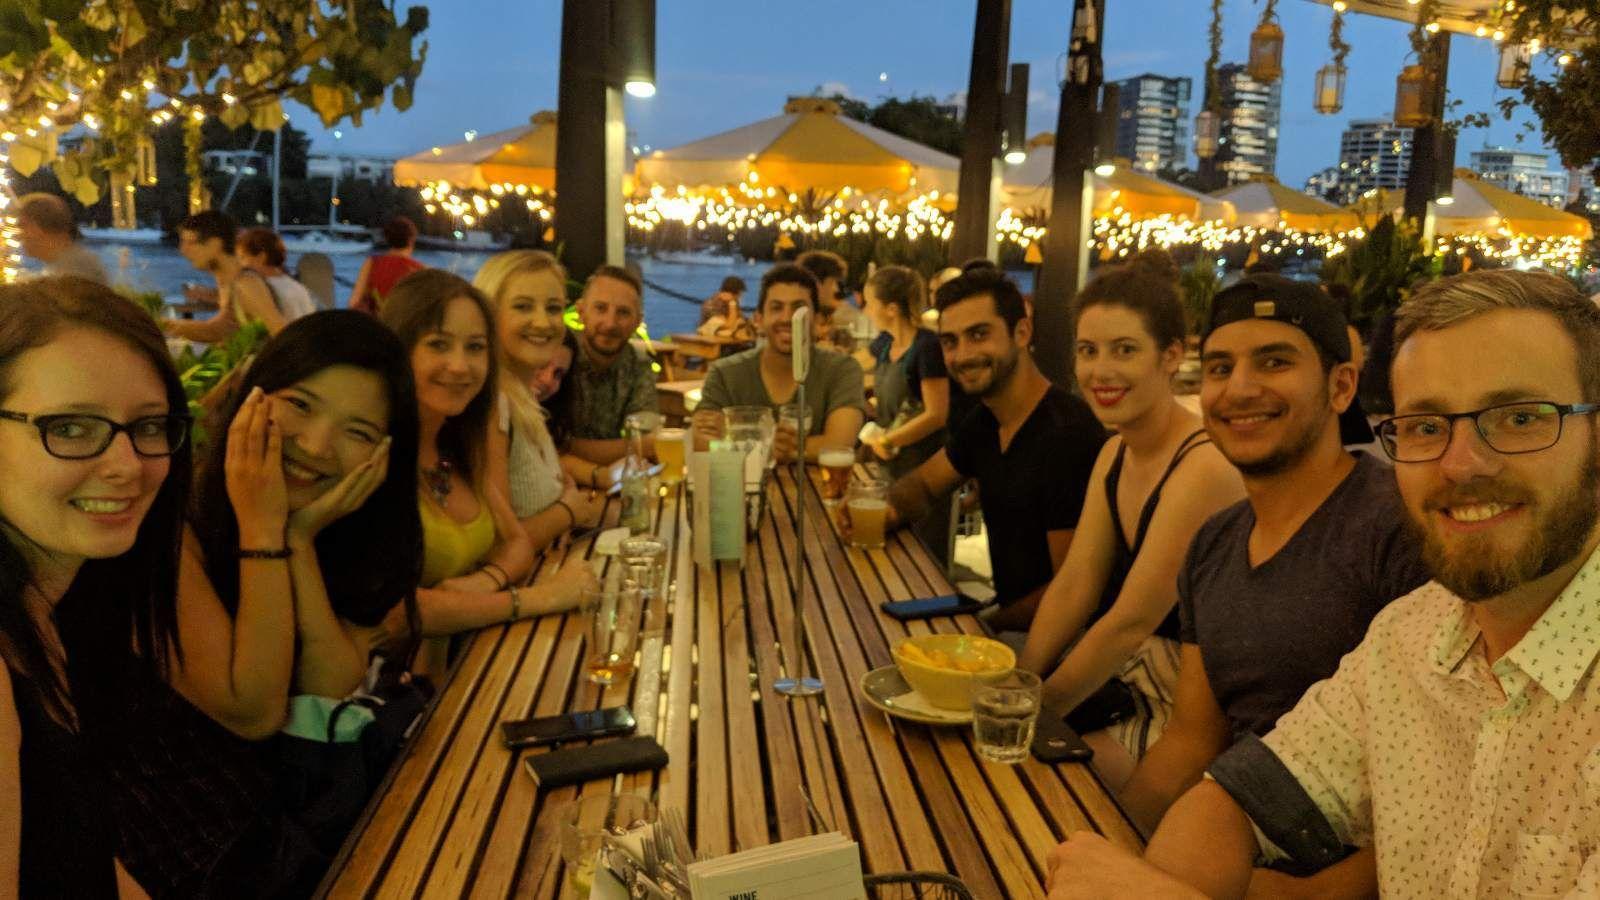 New to Brisbane or Meetup 20s 30s - Newbs